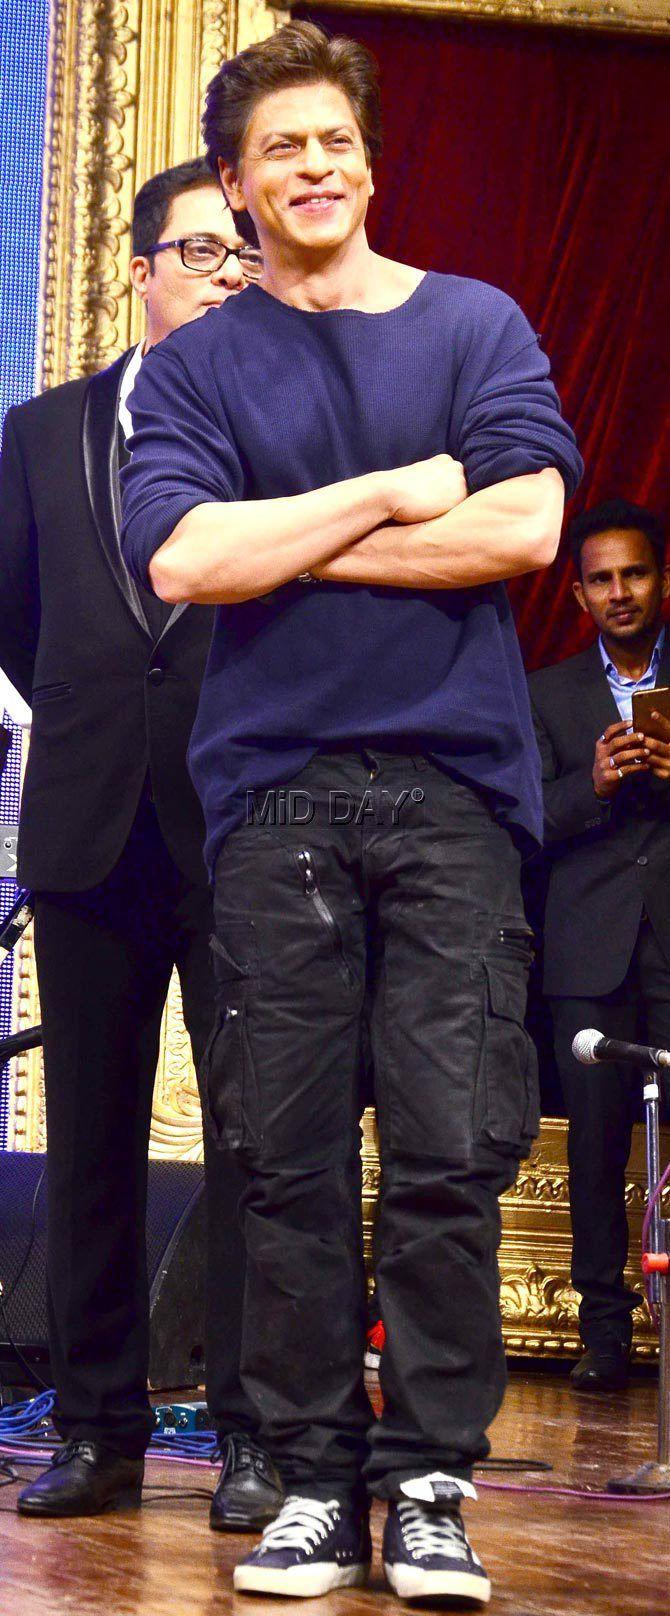 My Darling-  Shah Rukh Khan... he is too cute..!!